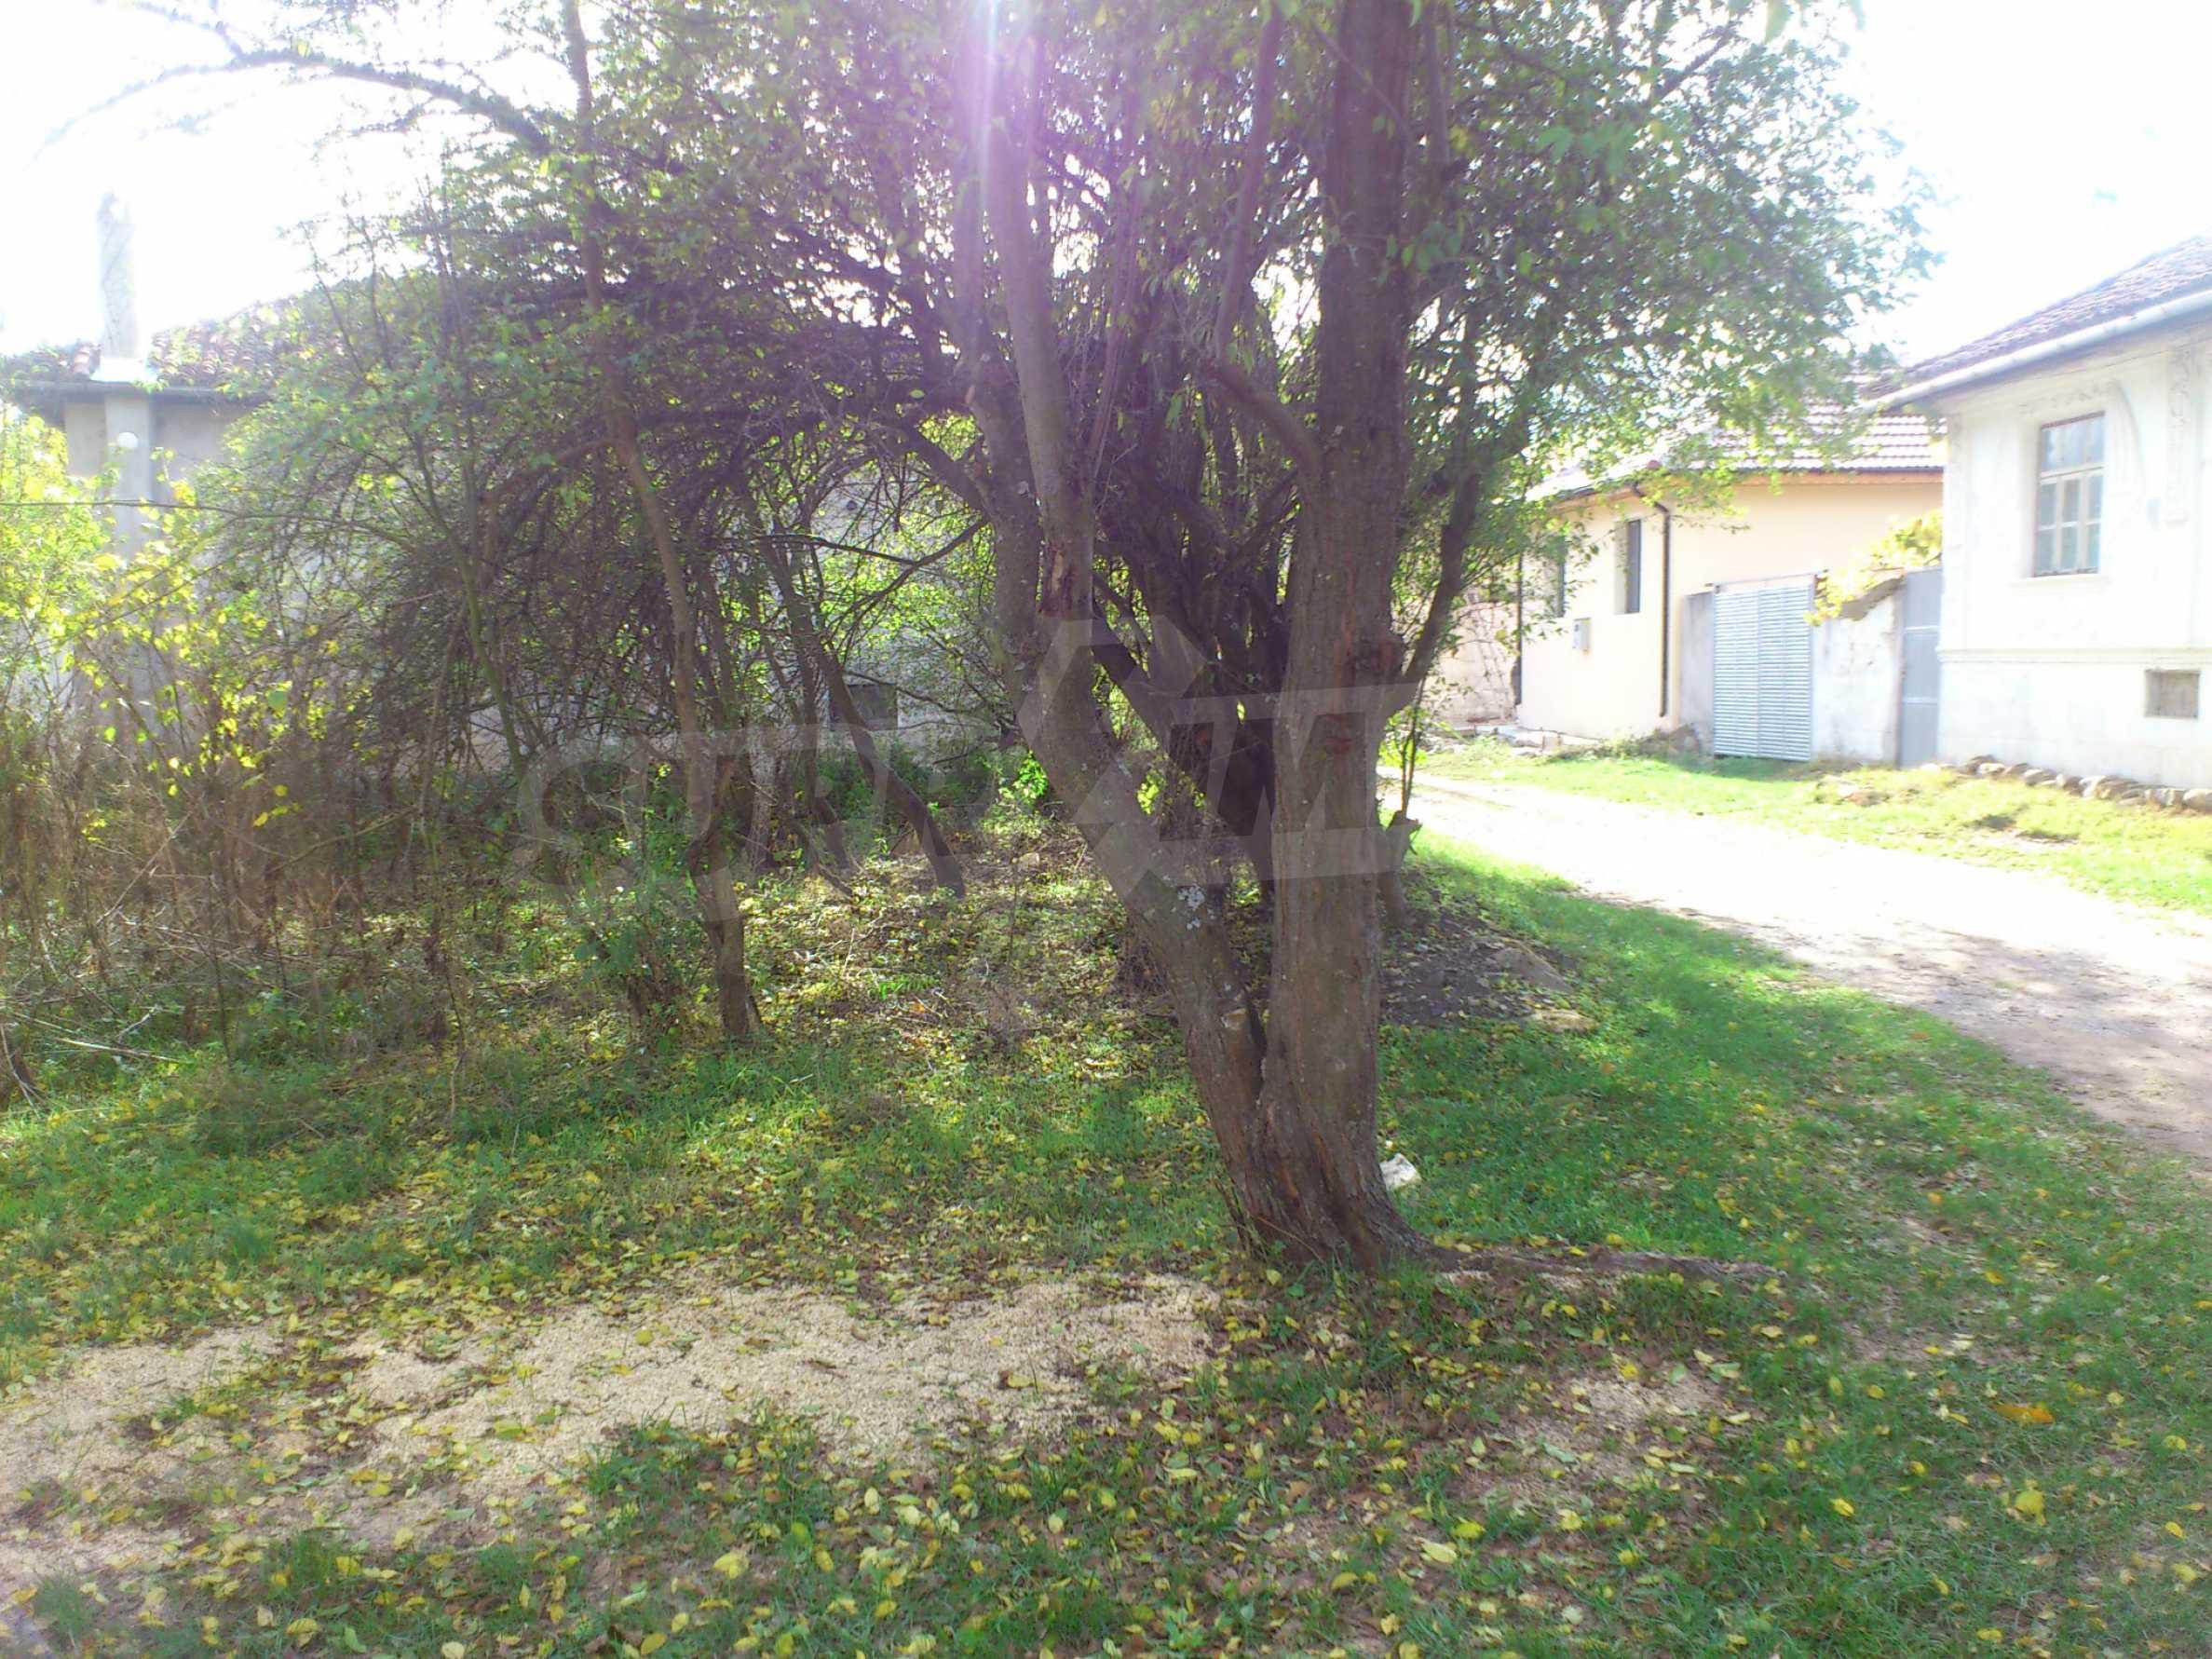 Hof nur 17 km von Veliko Tarnovo entfernt 4